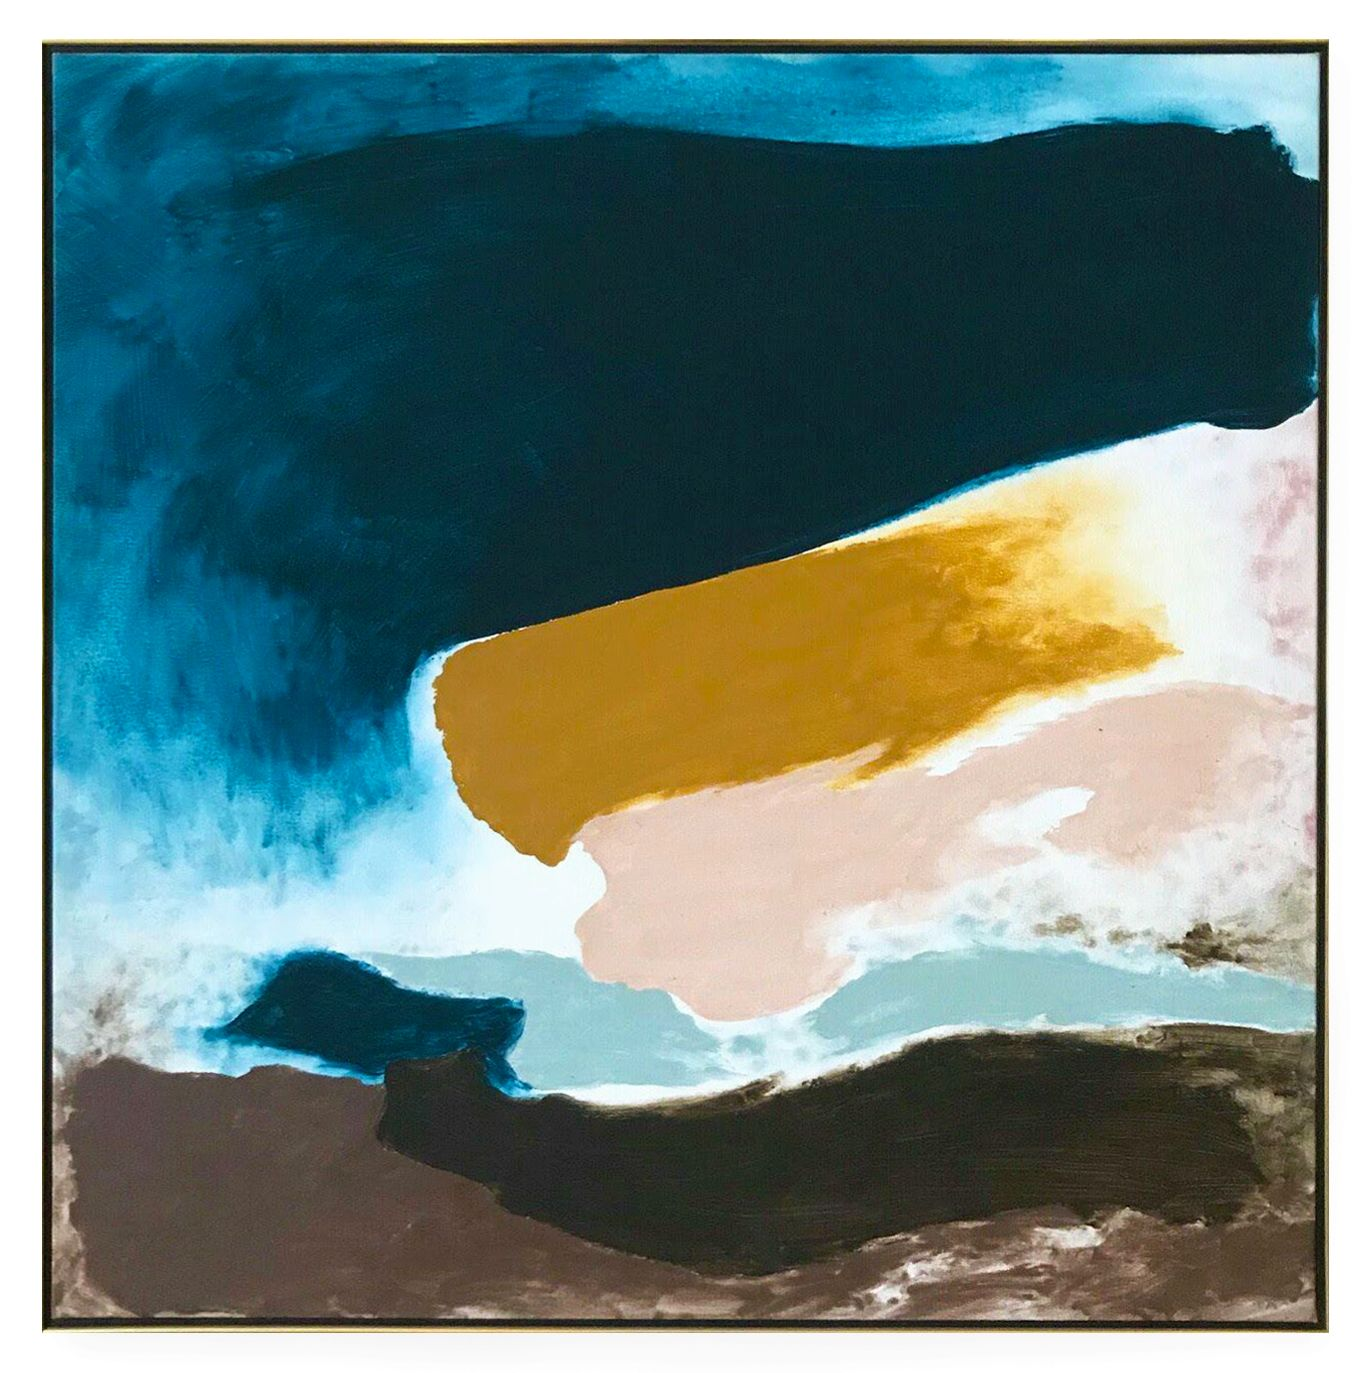 Friedel Dzubas, Soft Distance, 1982